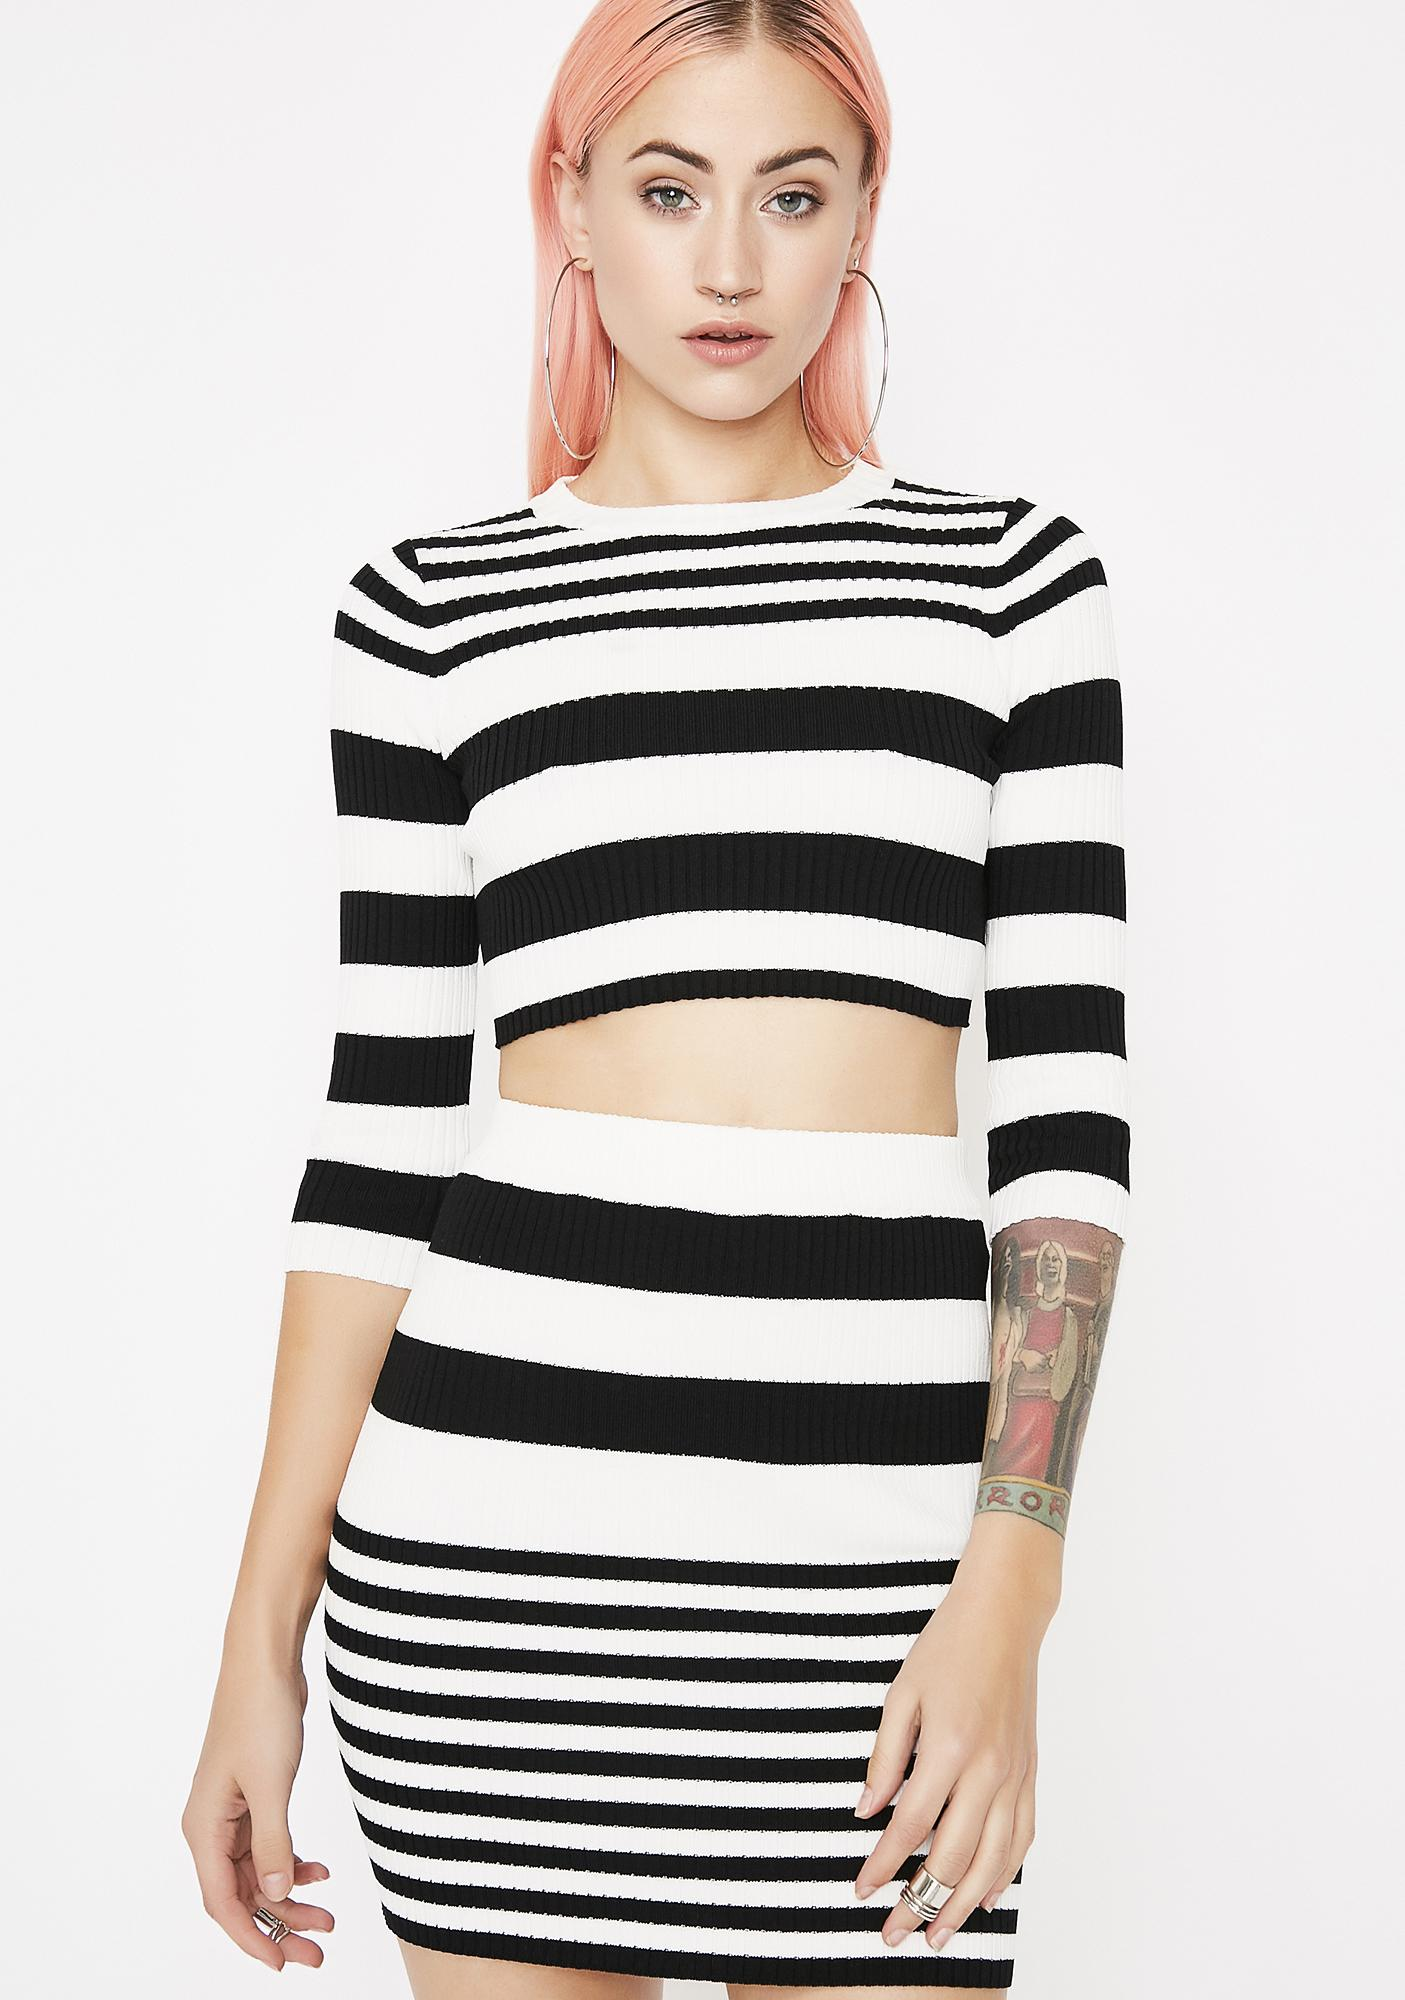 Joyride Striped Set